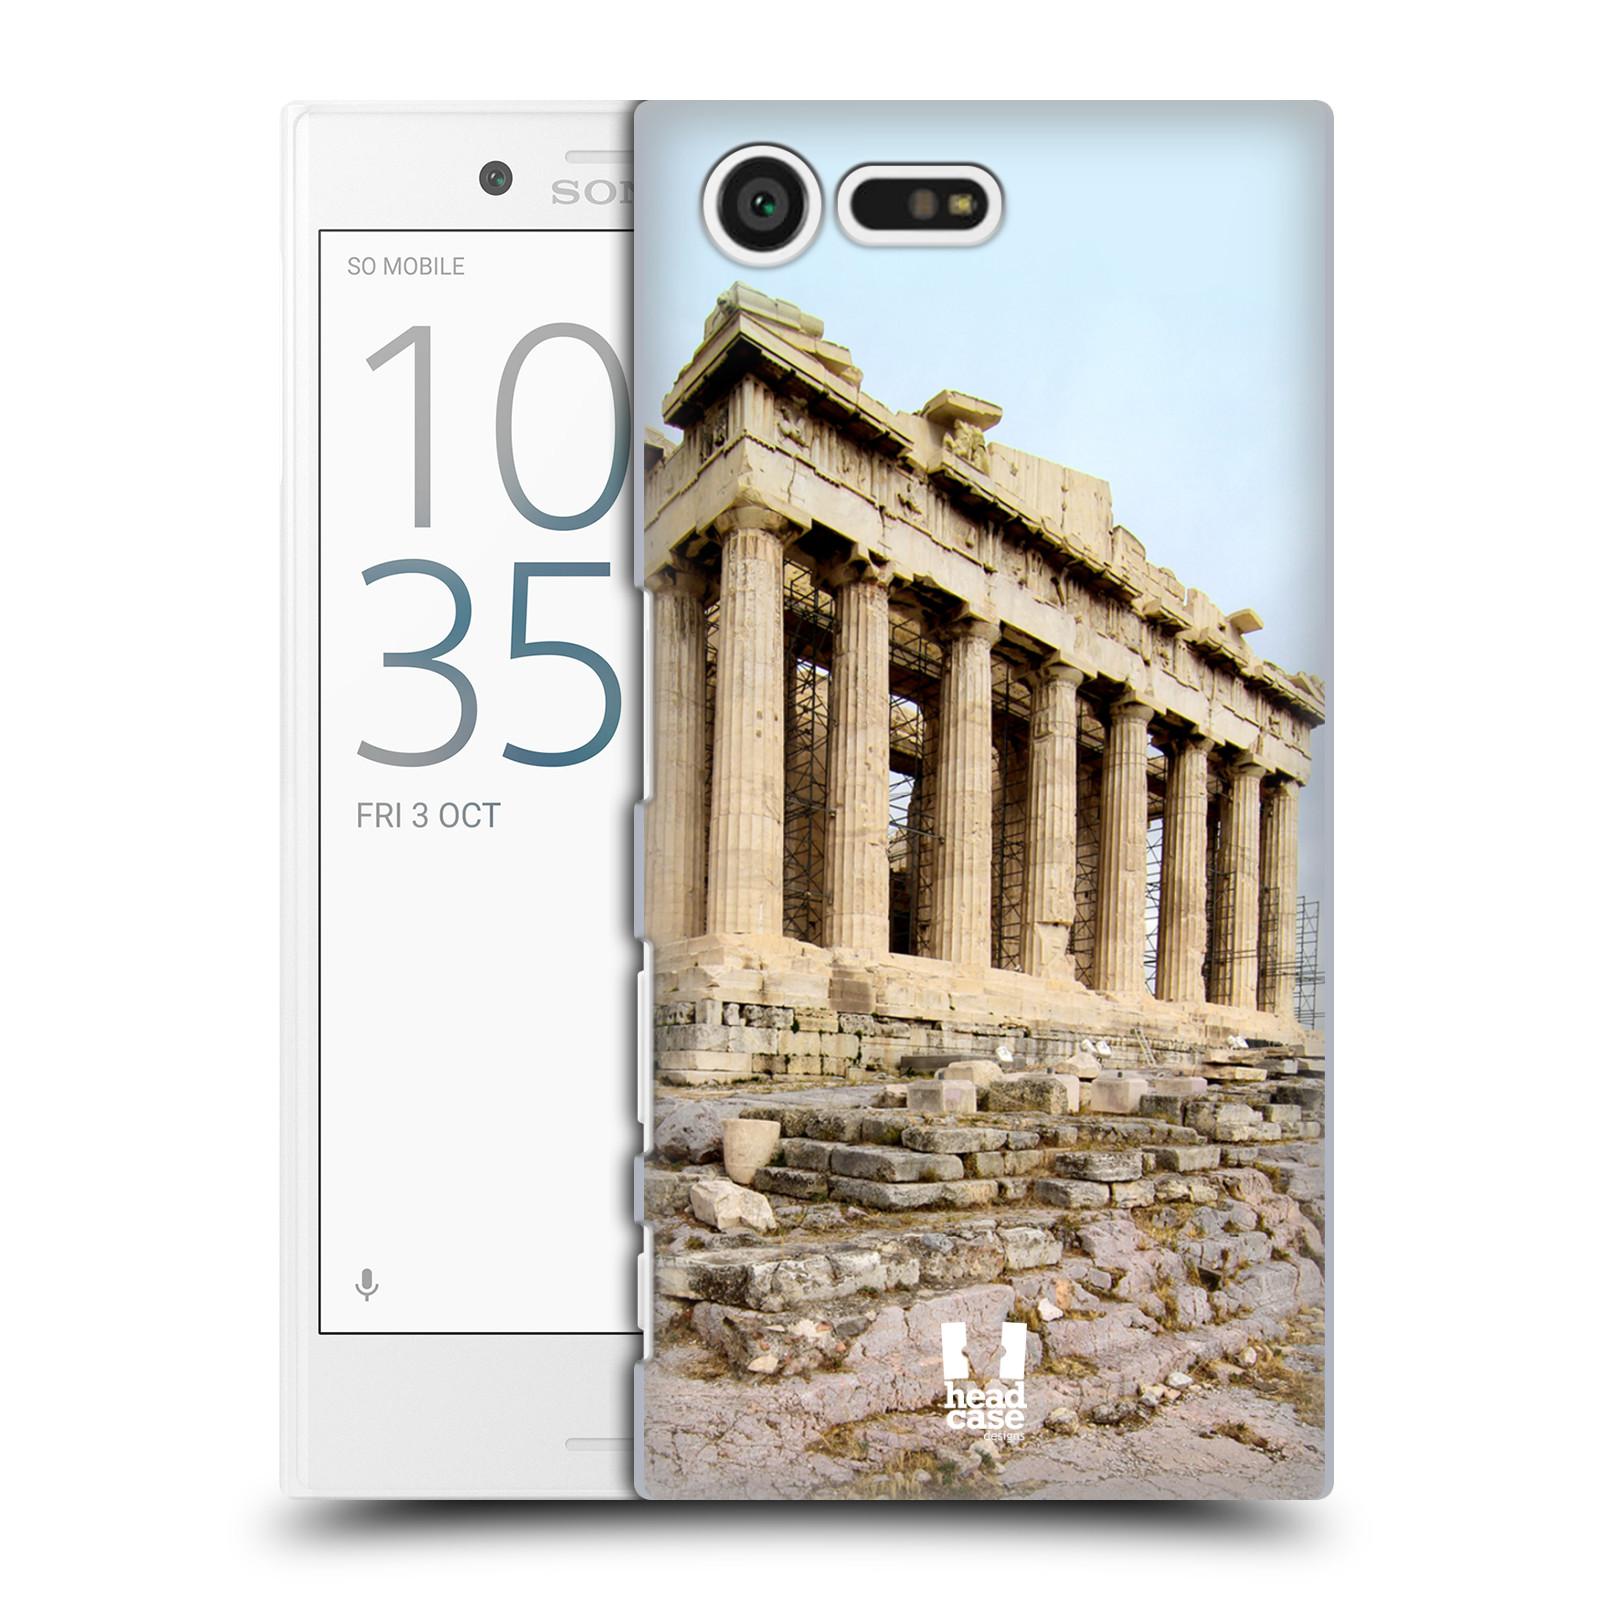 Case Designs famosos monumentos duro HEAD volver estuche para SONY XPERIA Compacto X